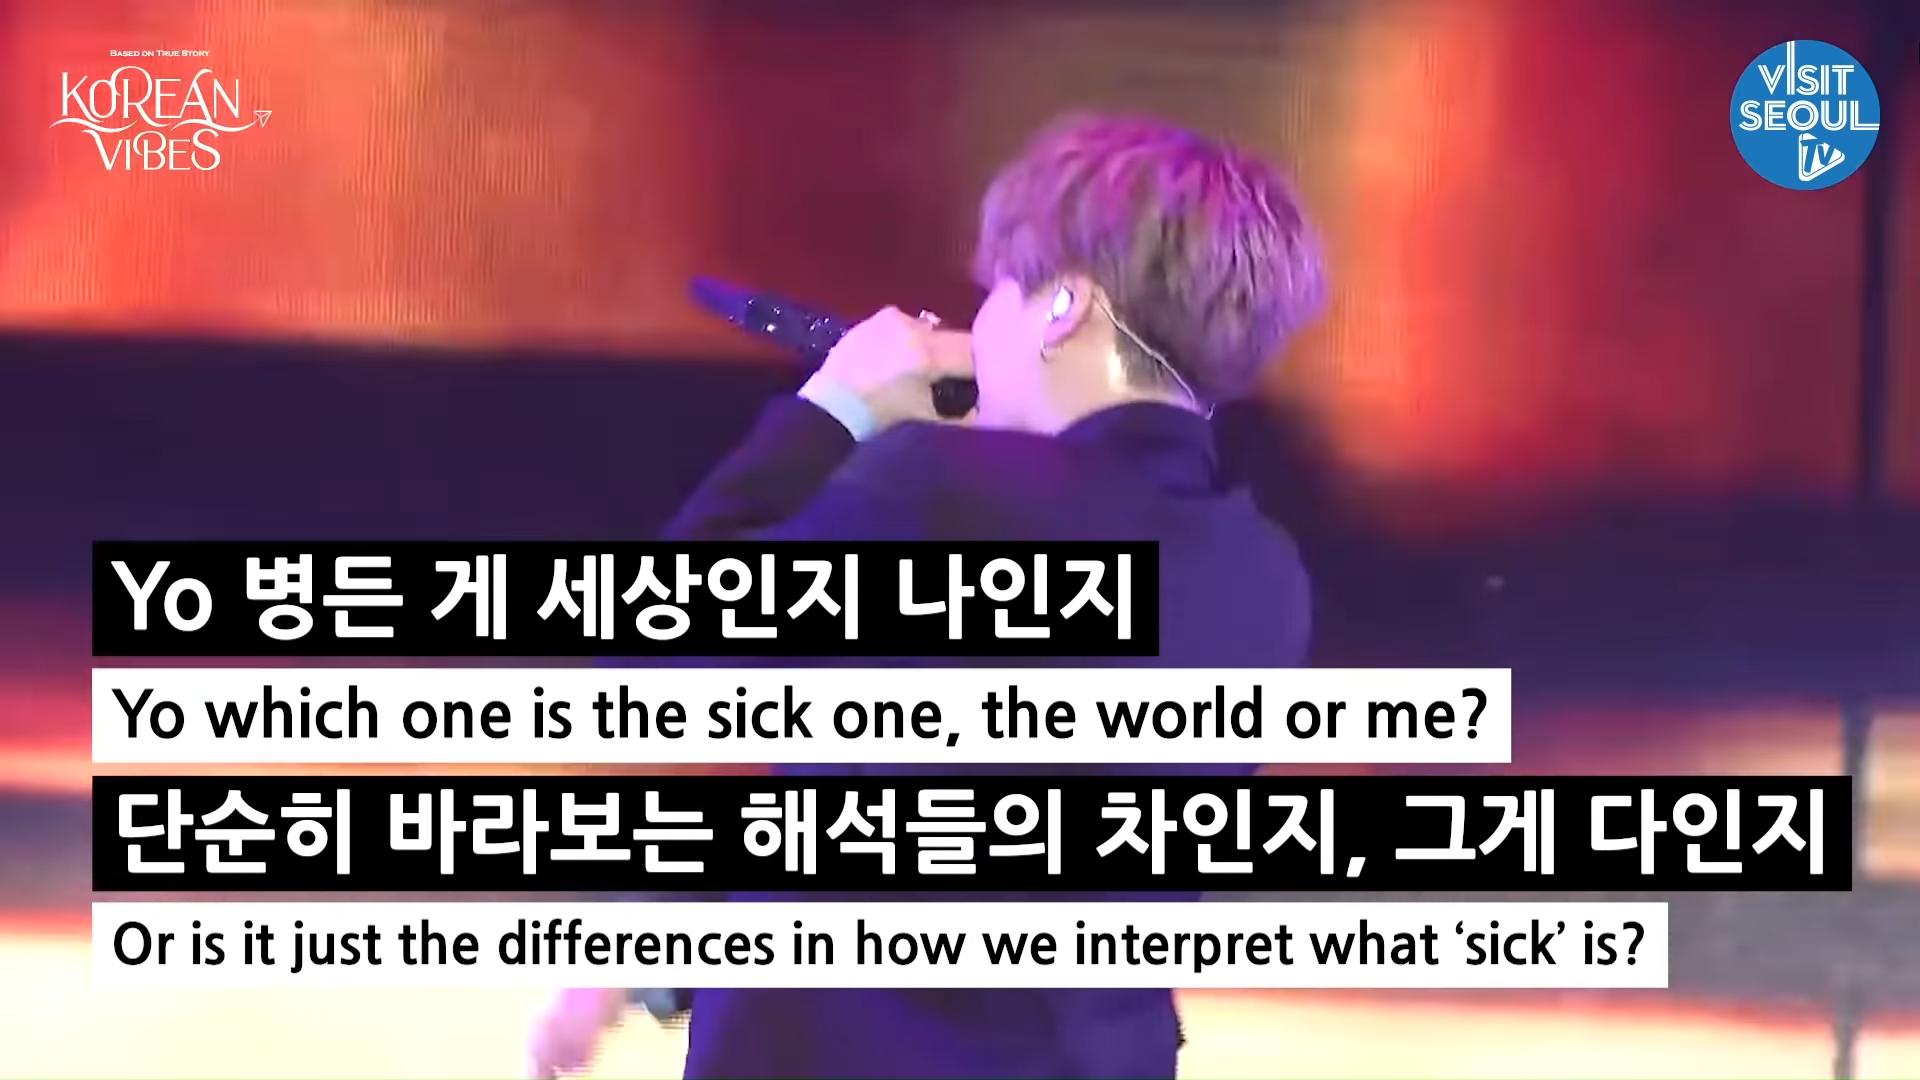 BTS - Dis-ease Explained by a Korean 9-0 screenshot